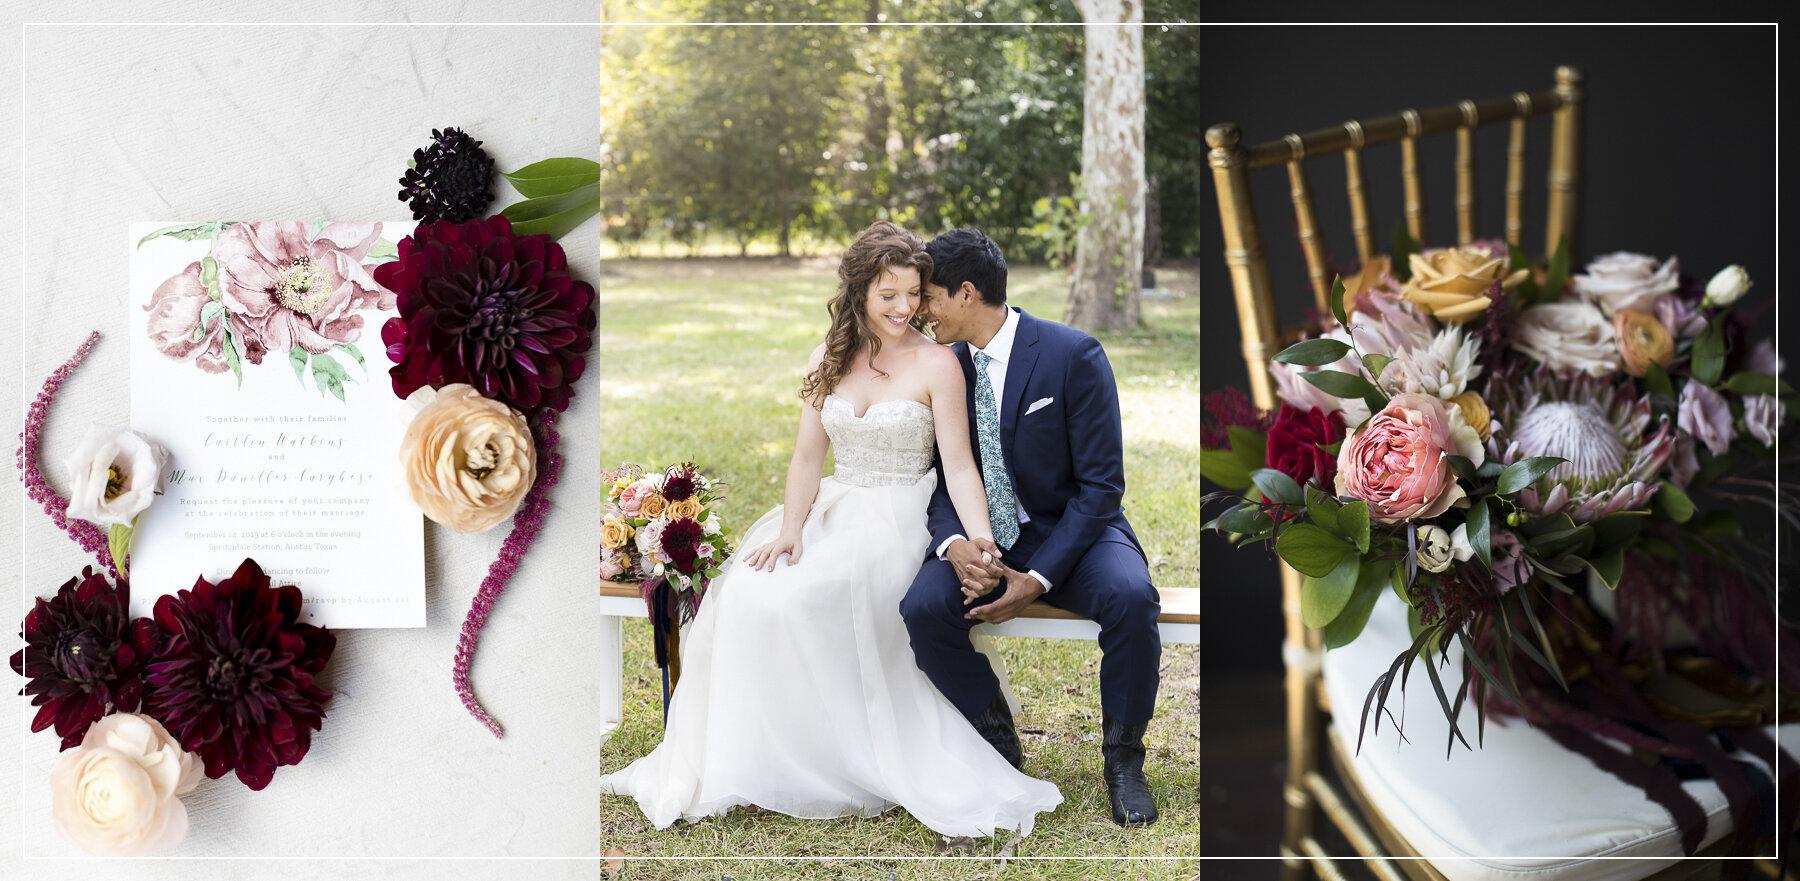 Austin-wedding-photographer-videographer copy.jpg